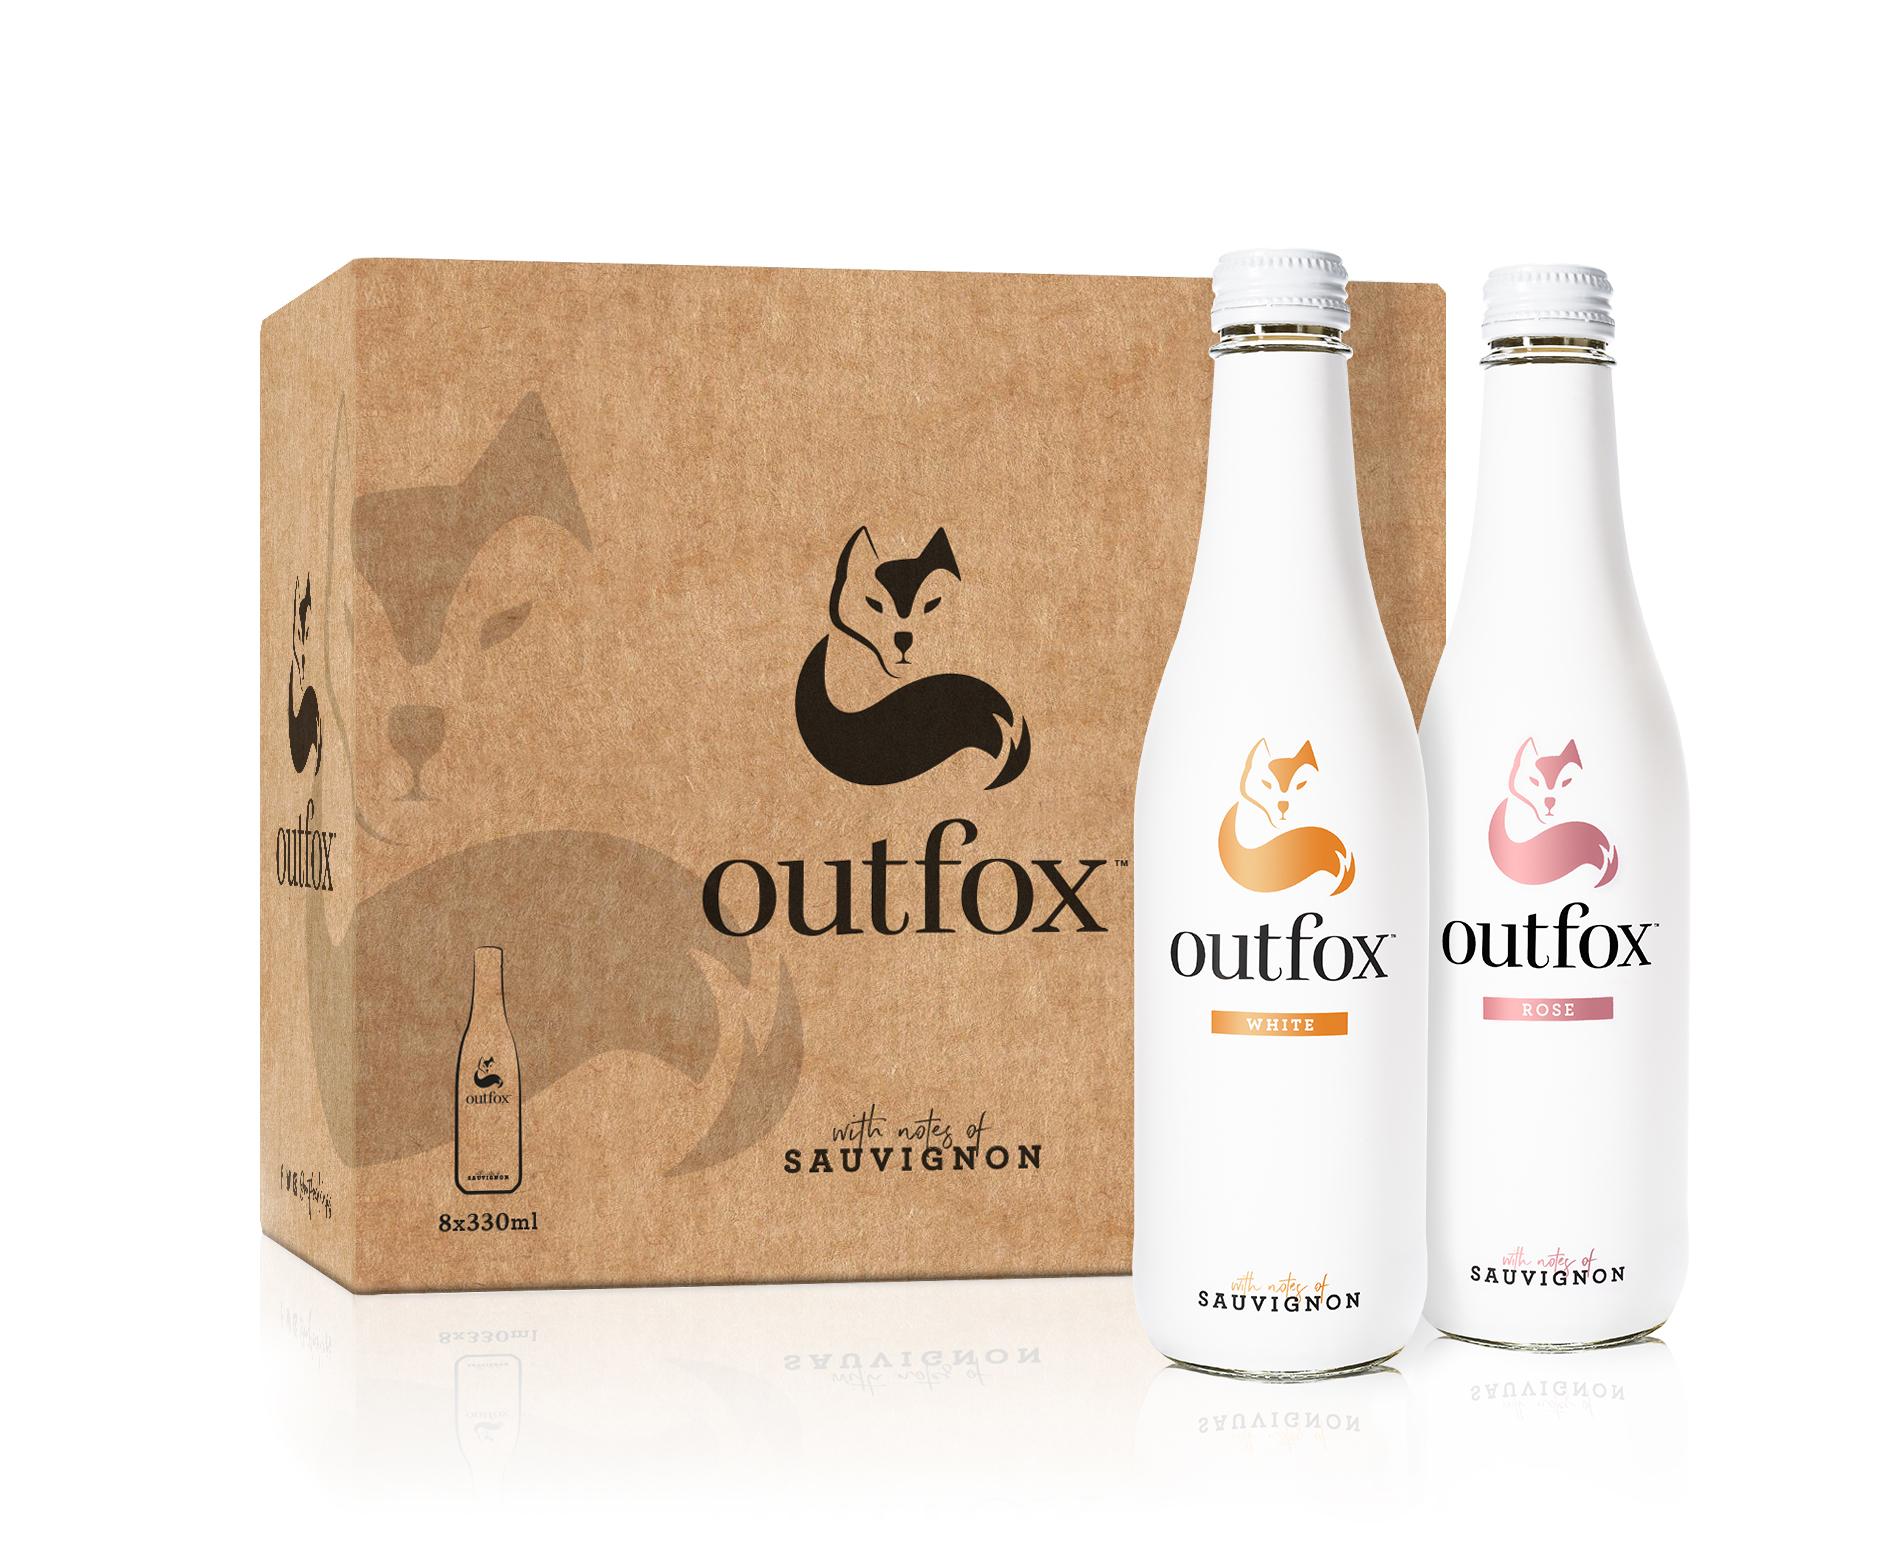 6846-Outfox-8x330ml-Pack-Shot_8x330ml-Box-and-Both-Bottles_03